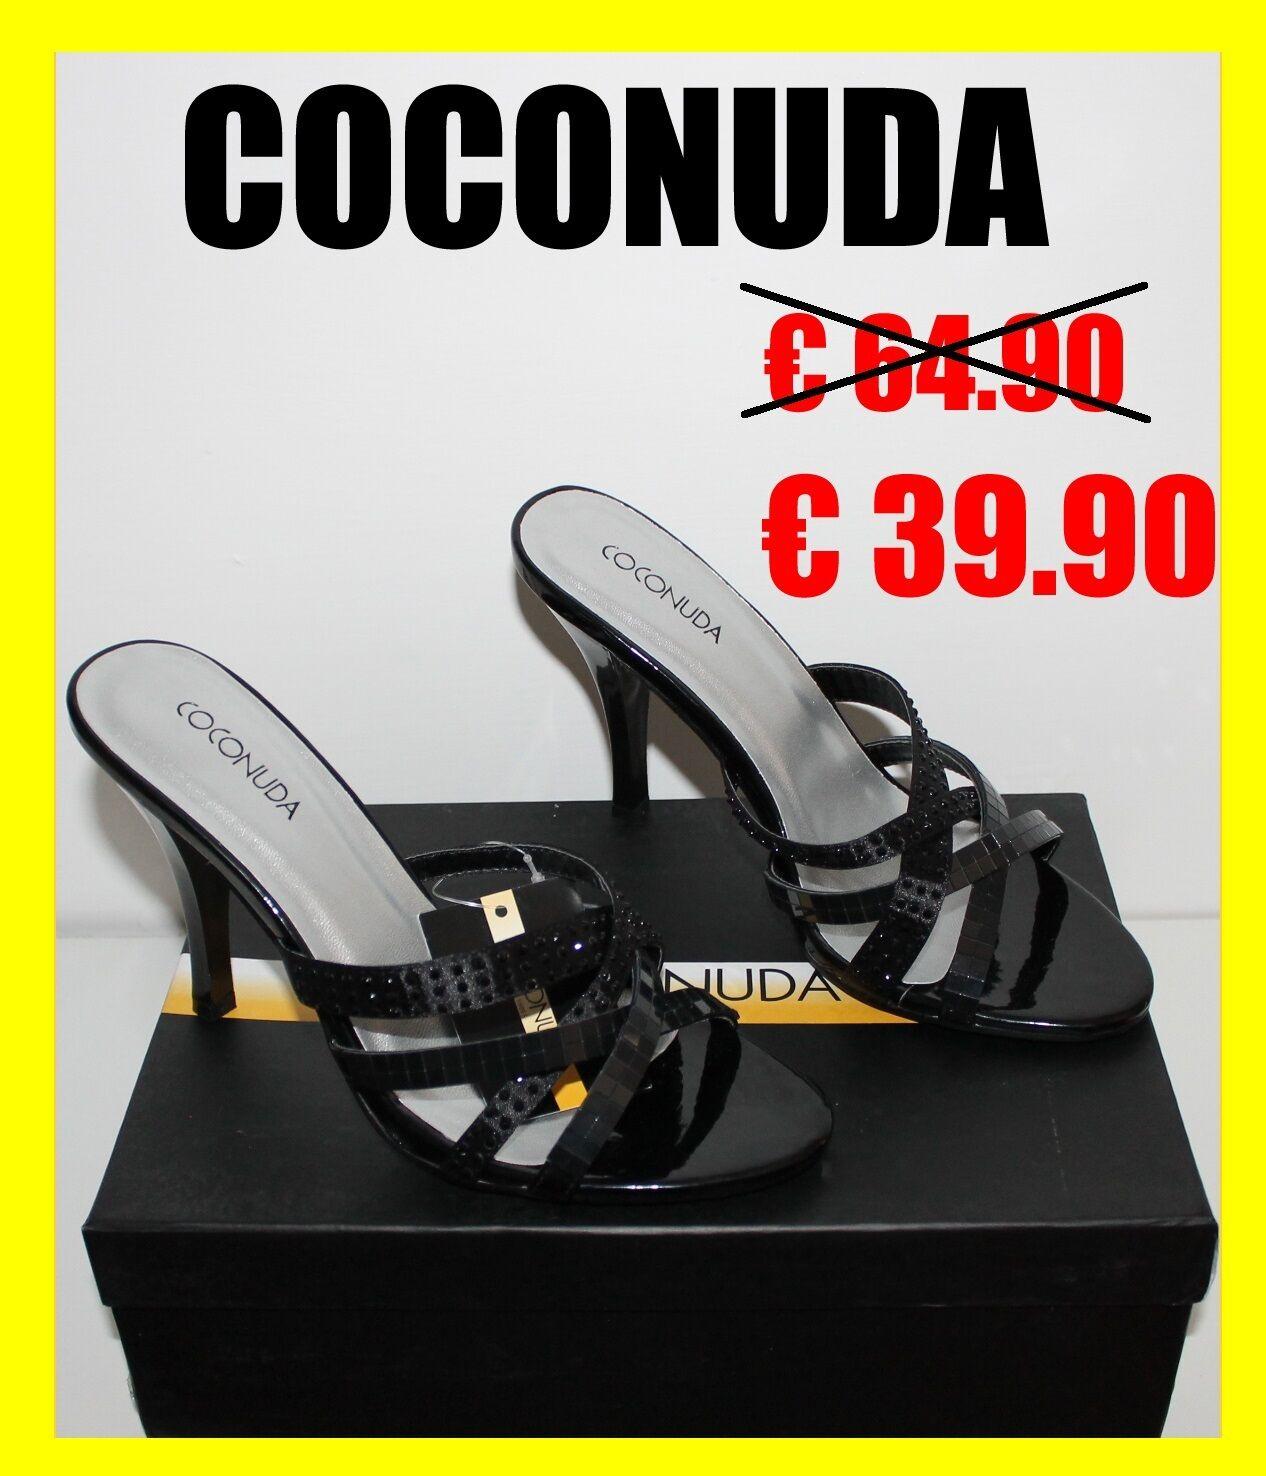 SANDALIAS chaussures de salón femmes COCONUDA 36 37 38 39 40 41